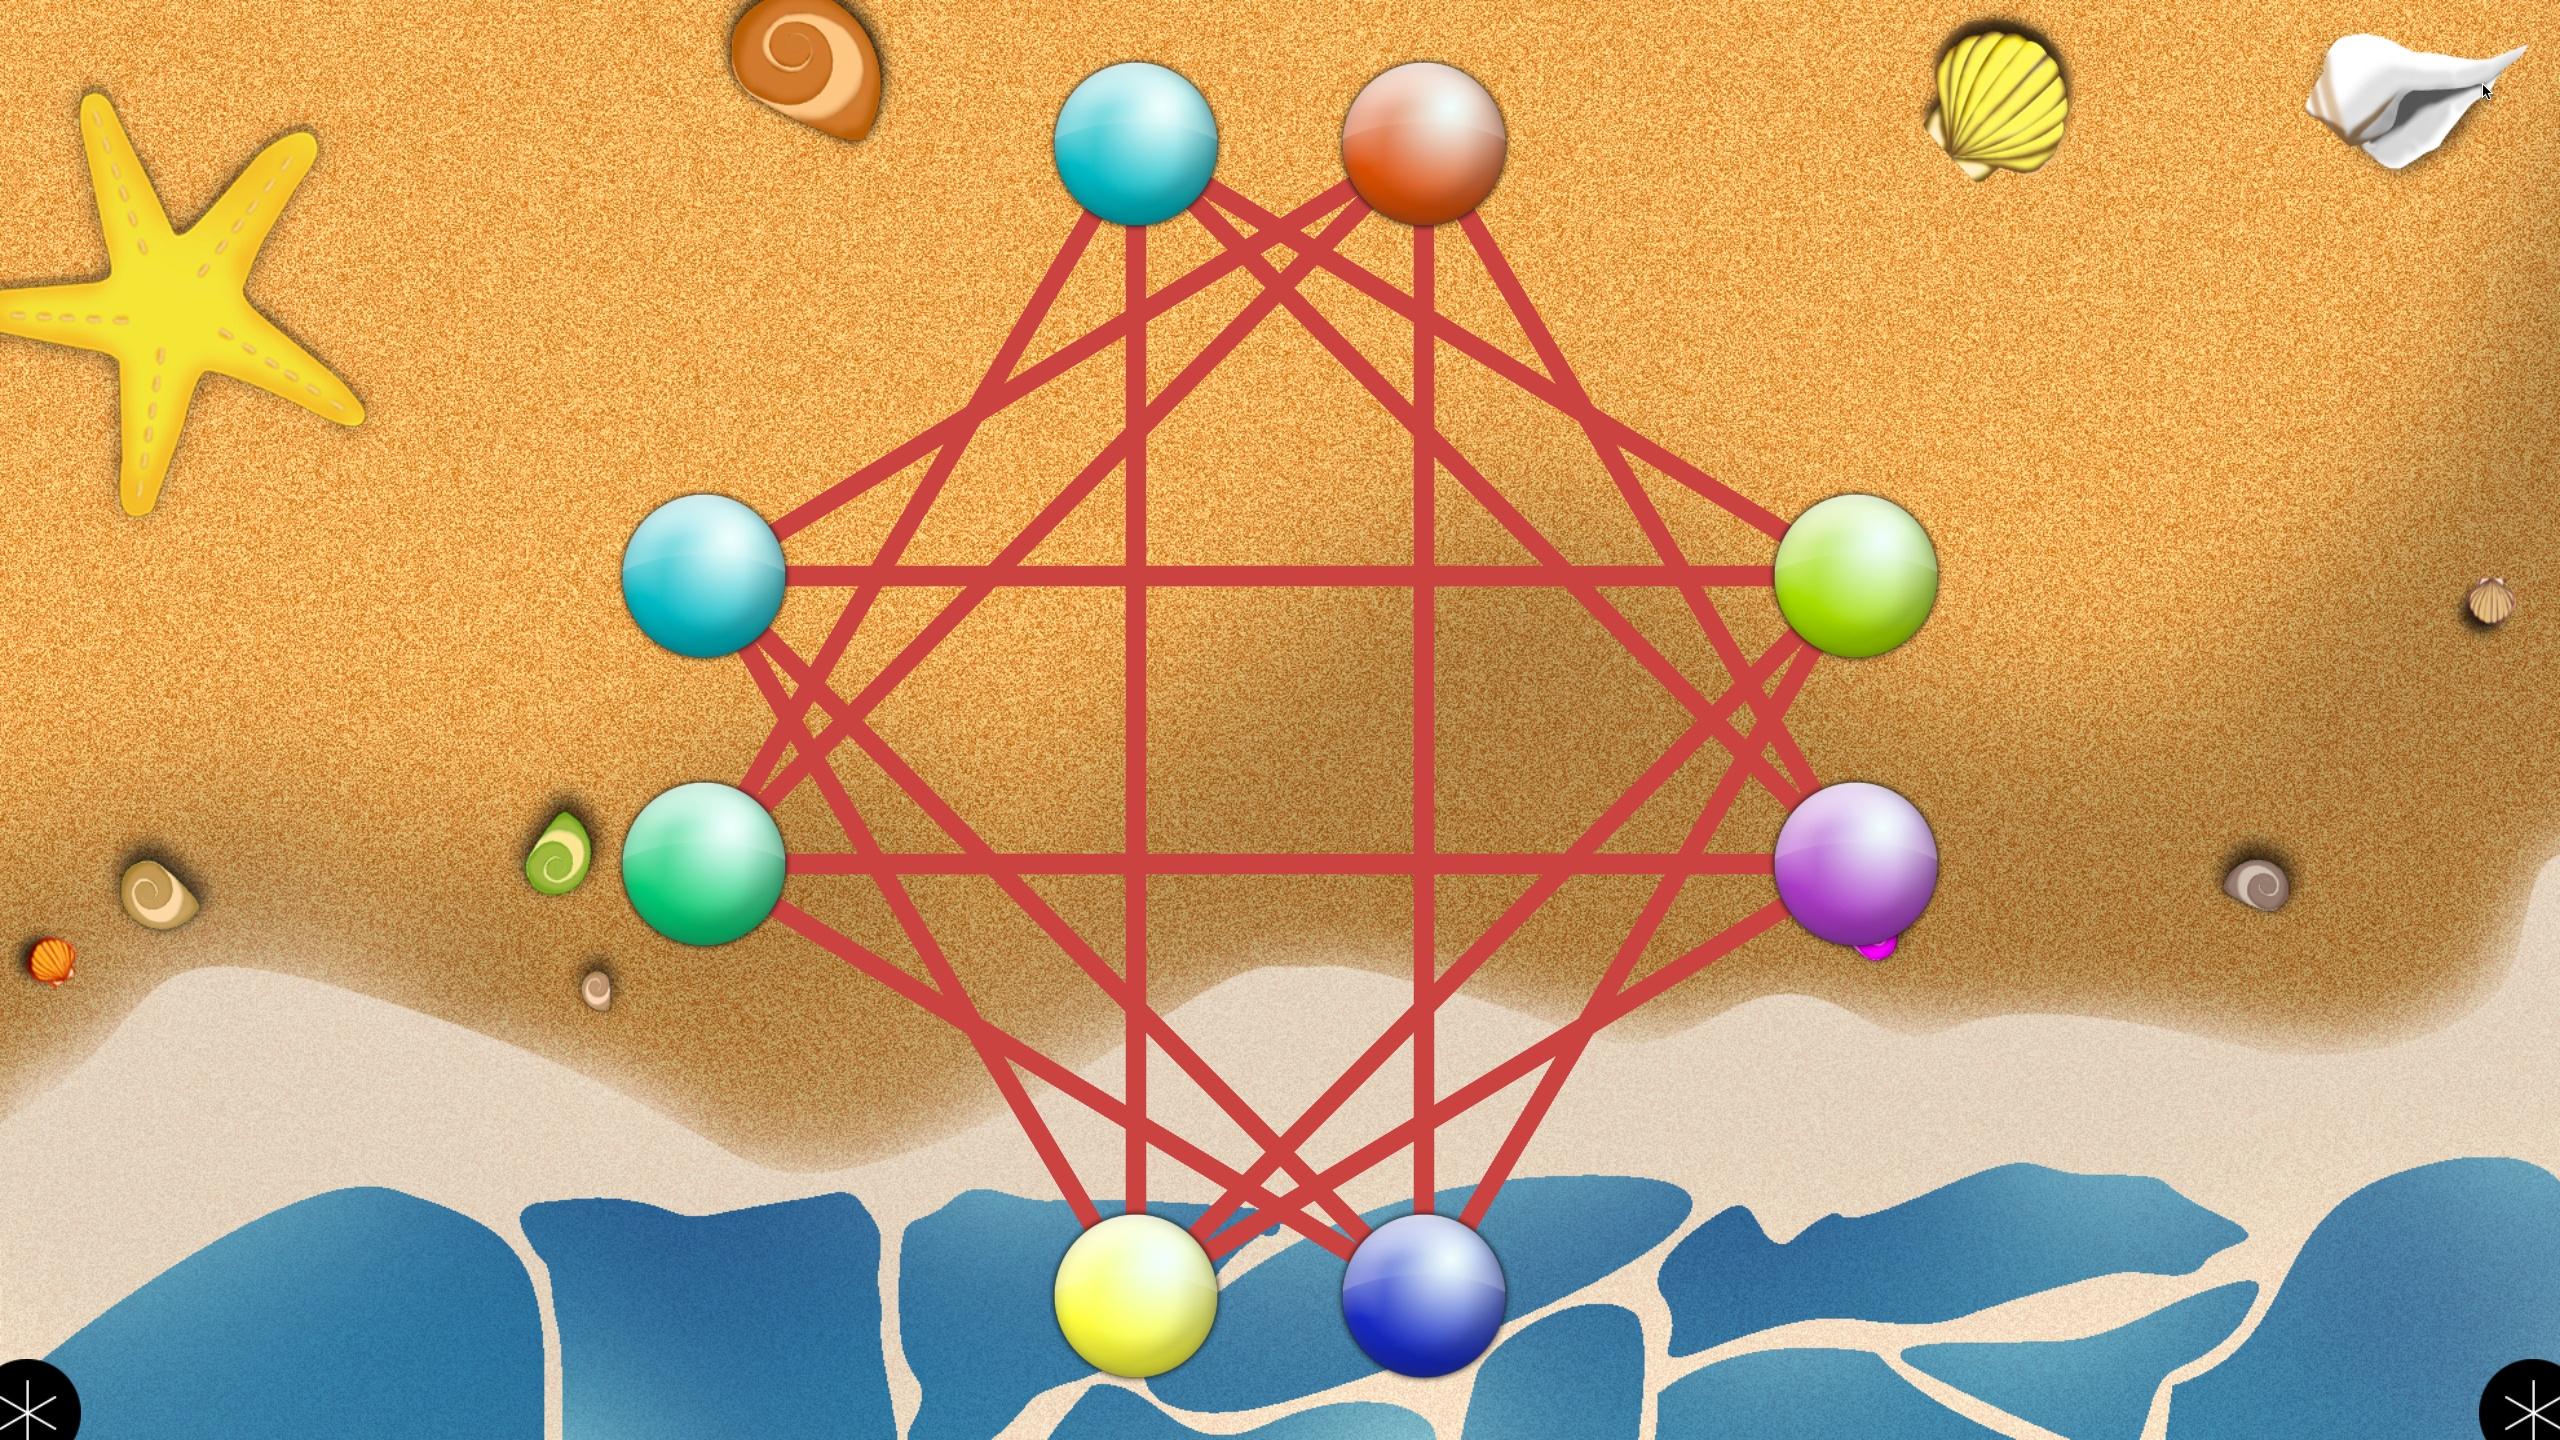 Untangle-1.jpg